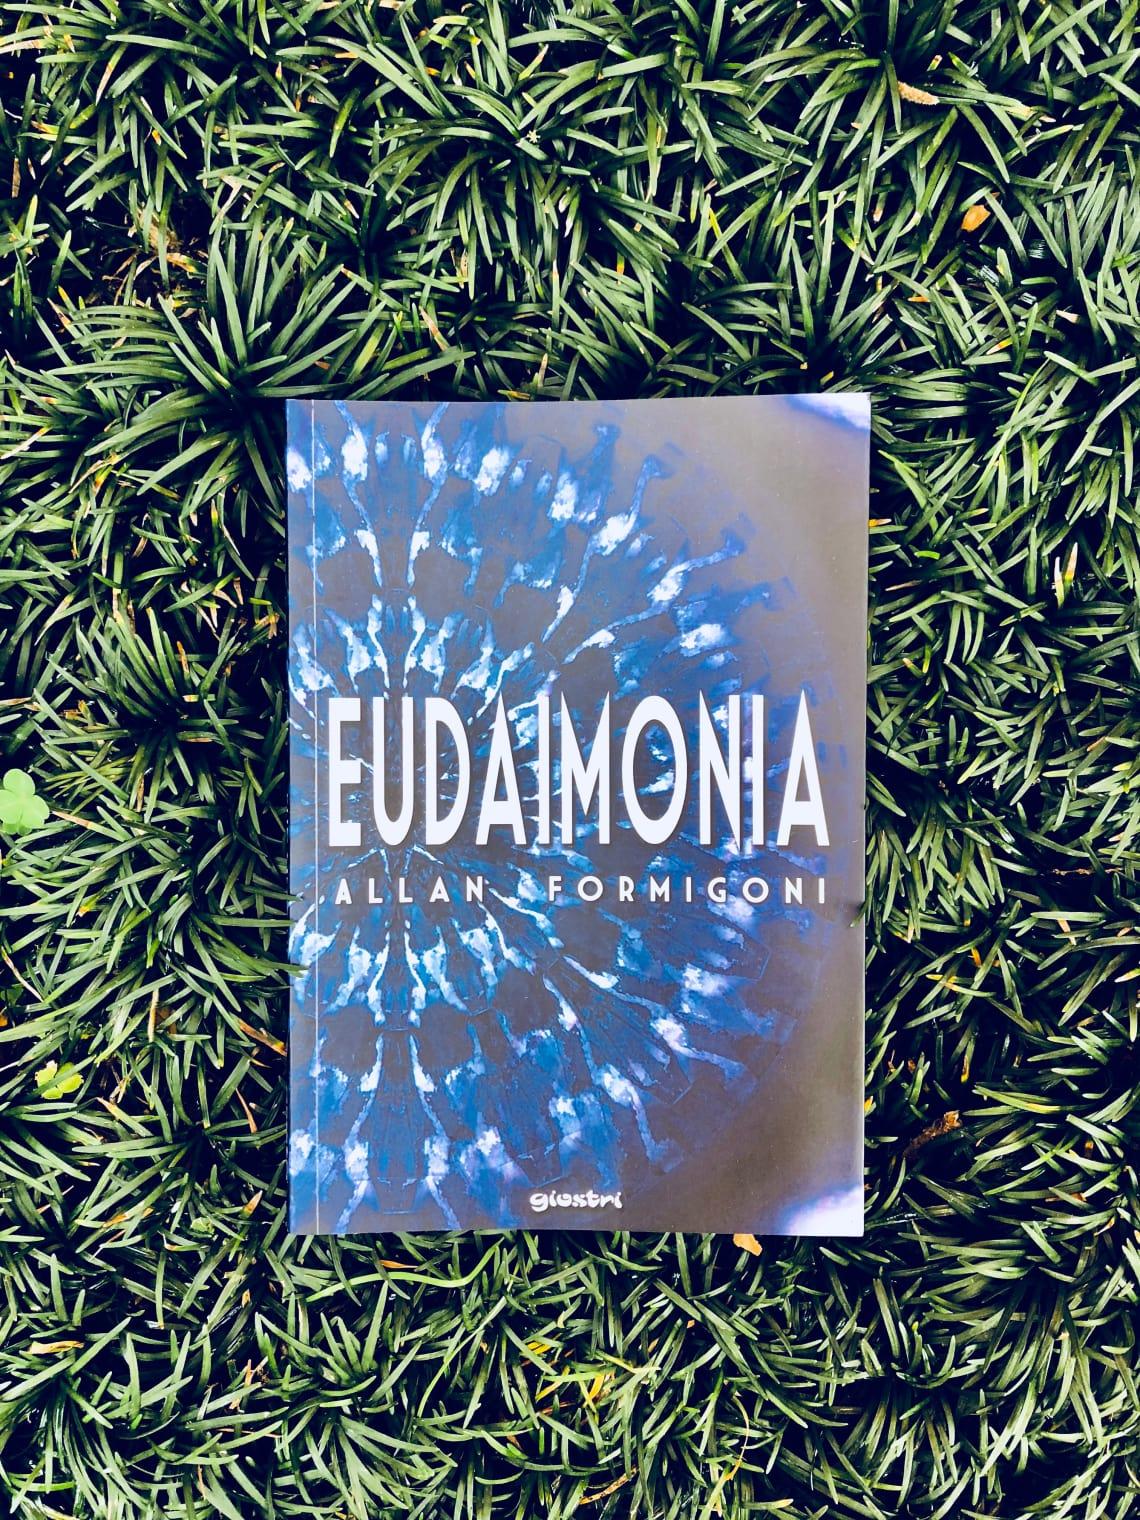 Eudaimonia, Allan Formigoni